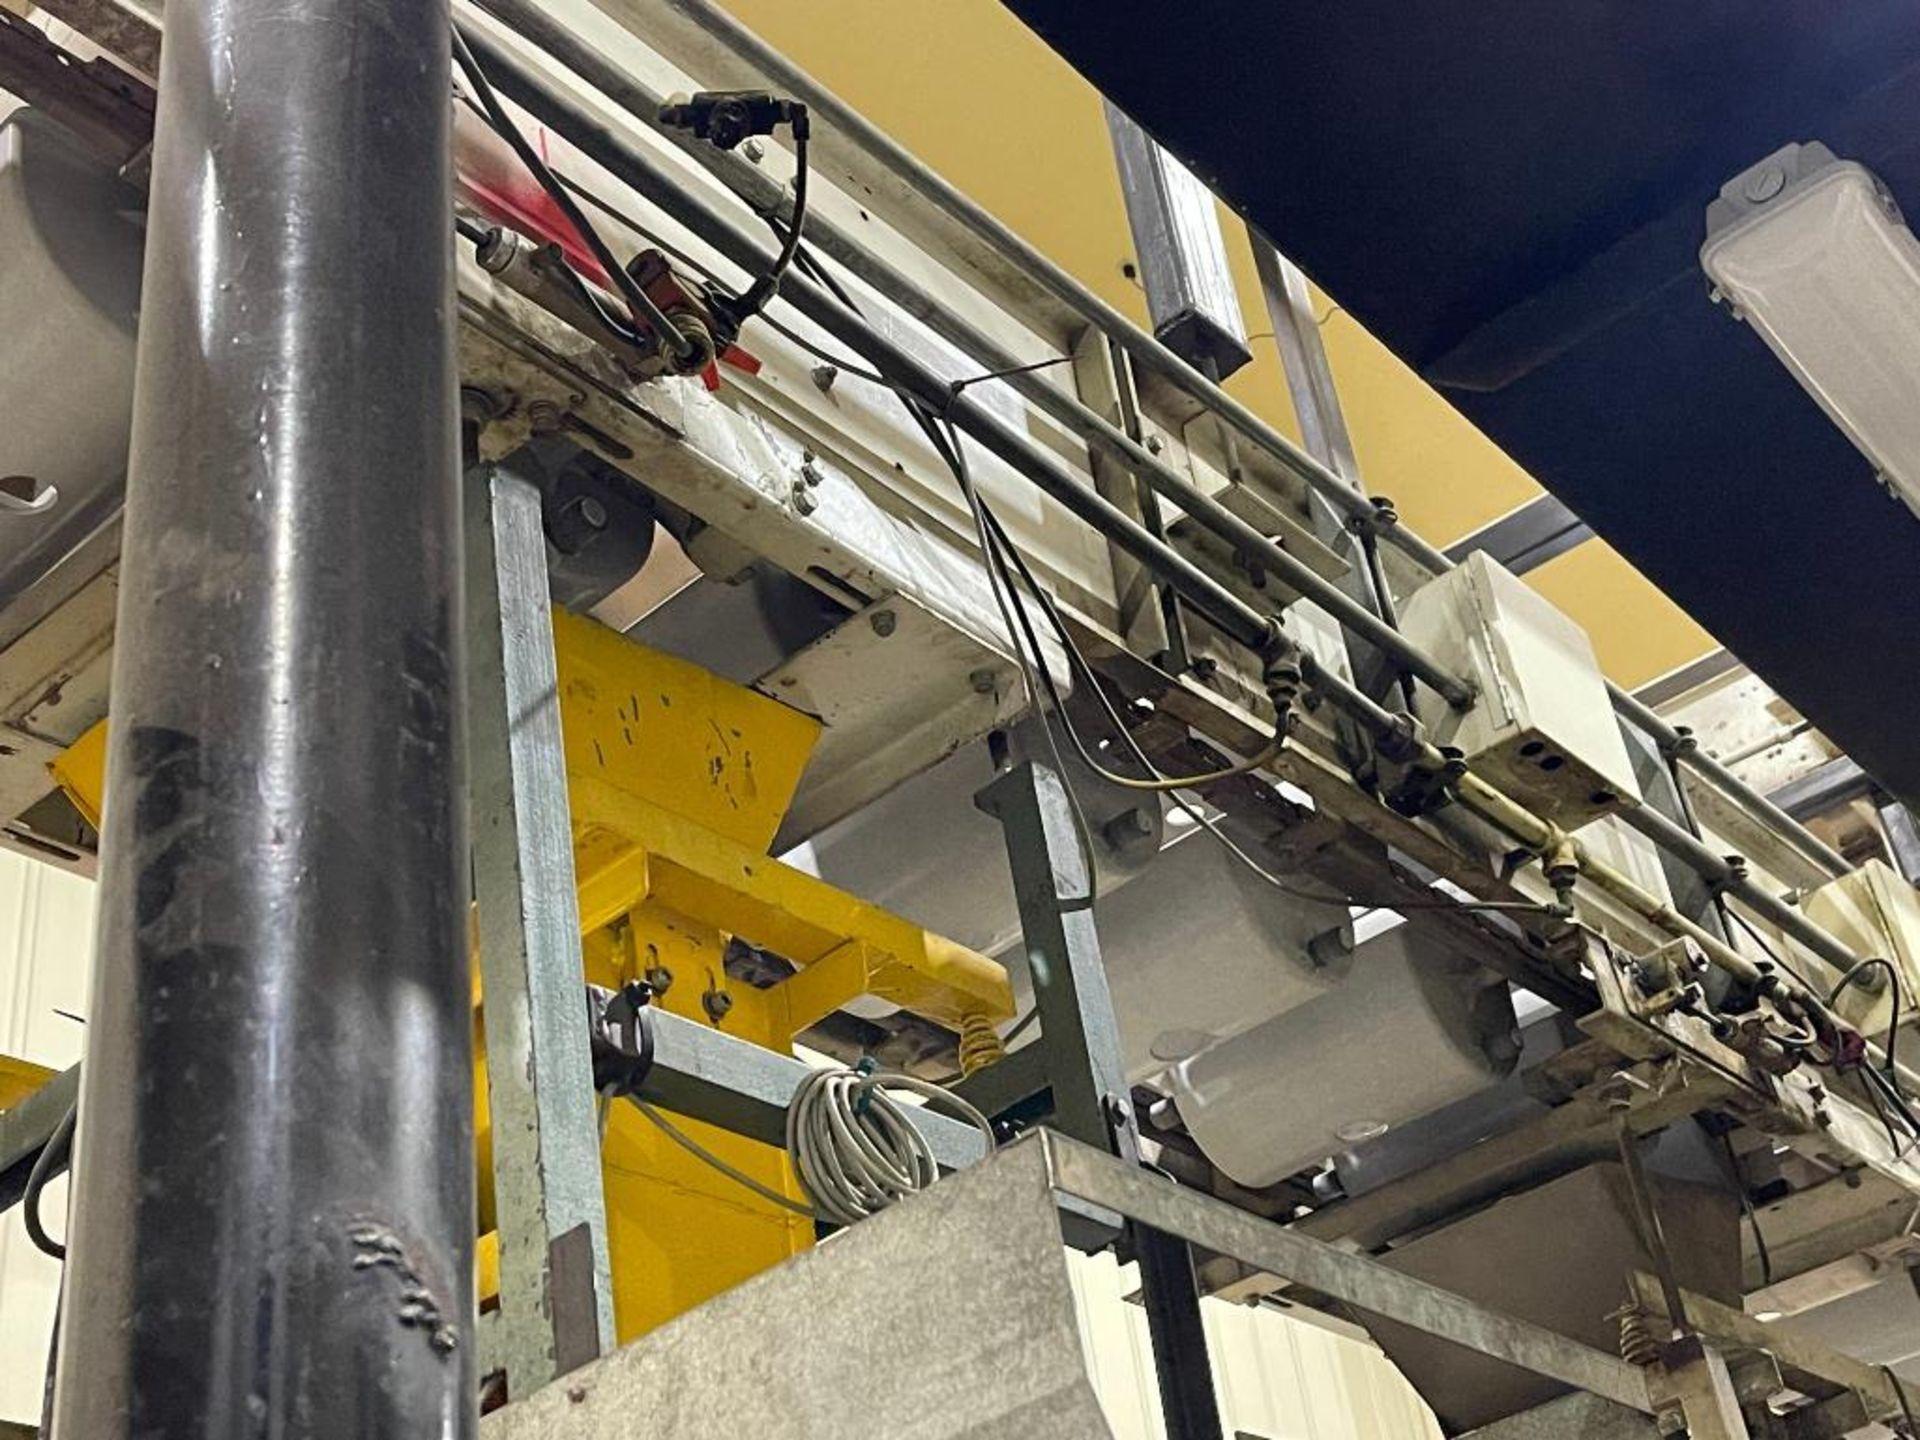 Meyer horizontal bucket elevator, model PQ-172-12-BCS - Image 16 of 19